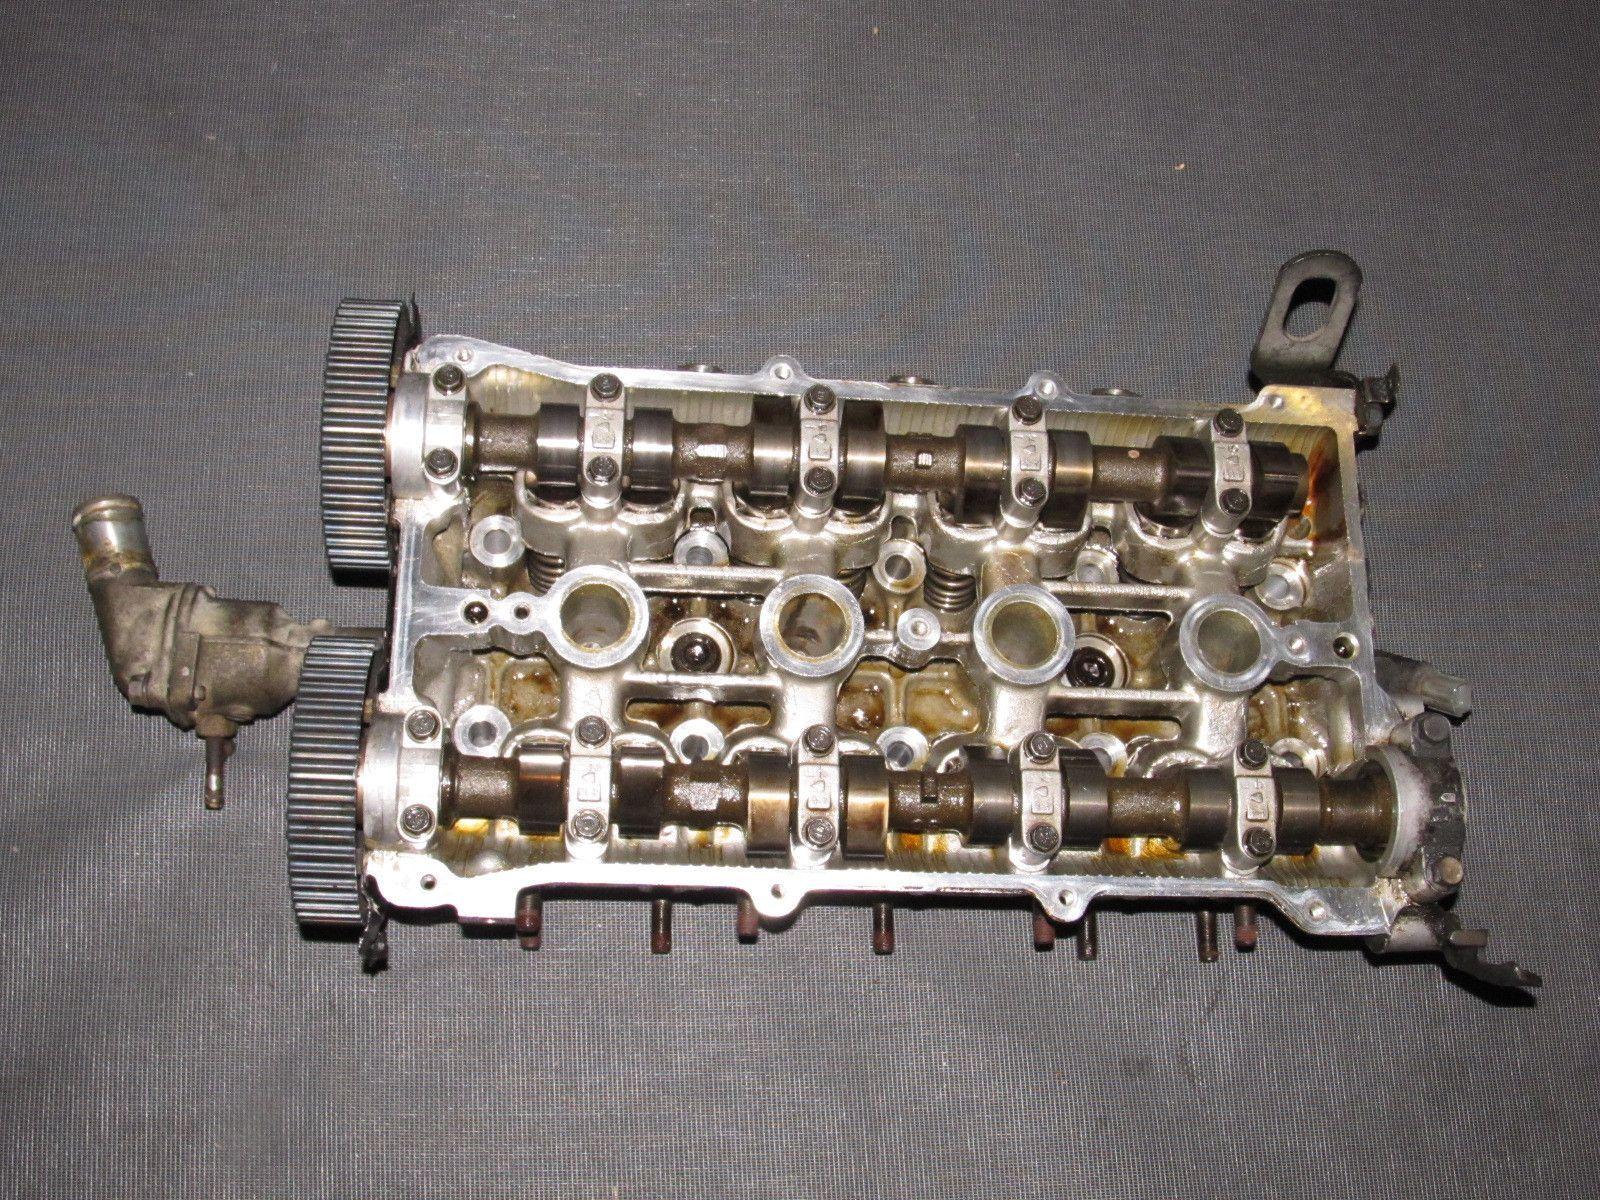 96 Miata Fuse Box Schematic Diagrams 91 94 95 97 Mazda Oem 1 8l Engine Cylinder Head Autopartone 1990 626 Diagram